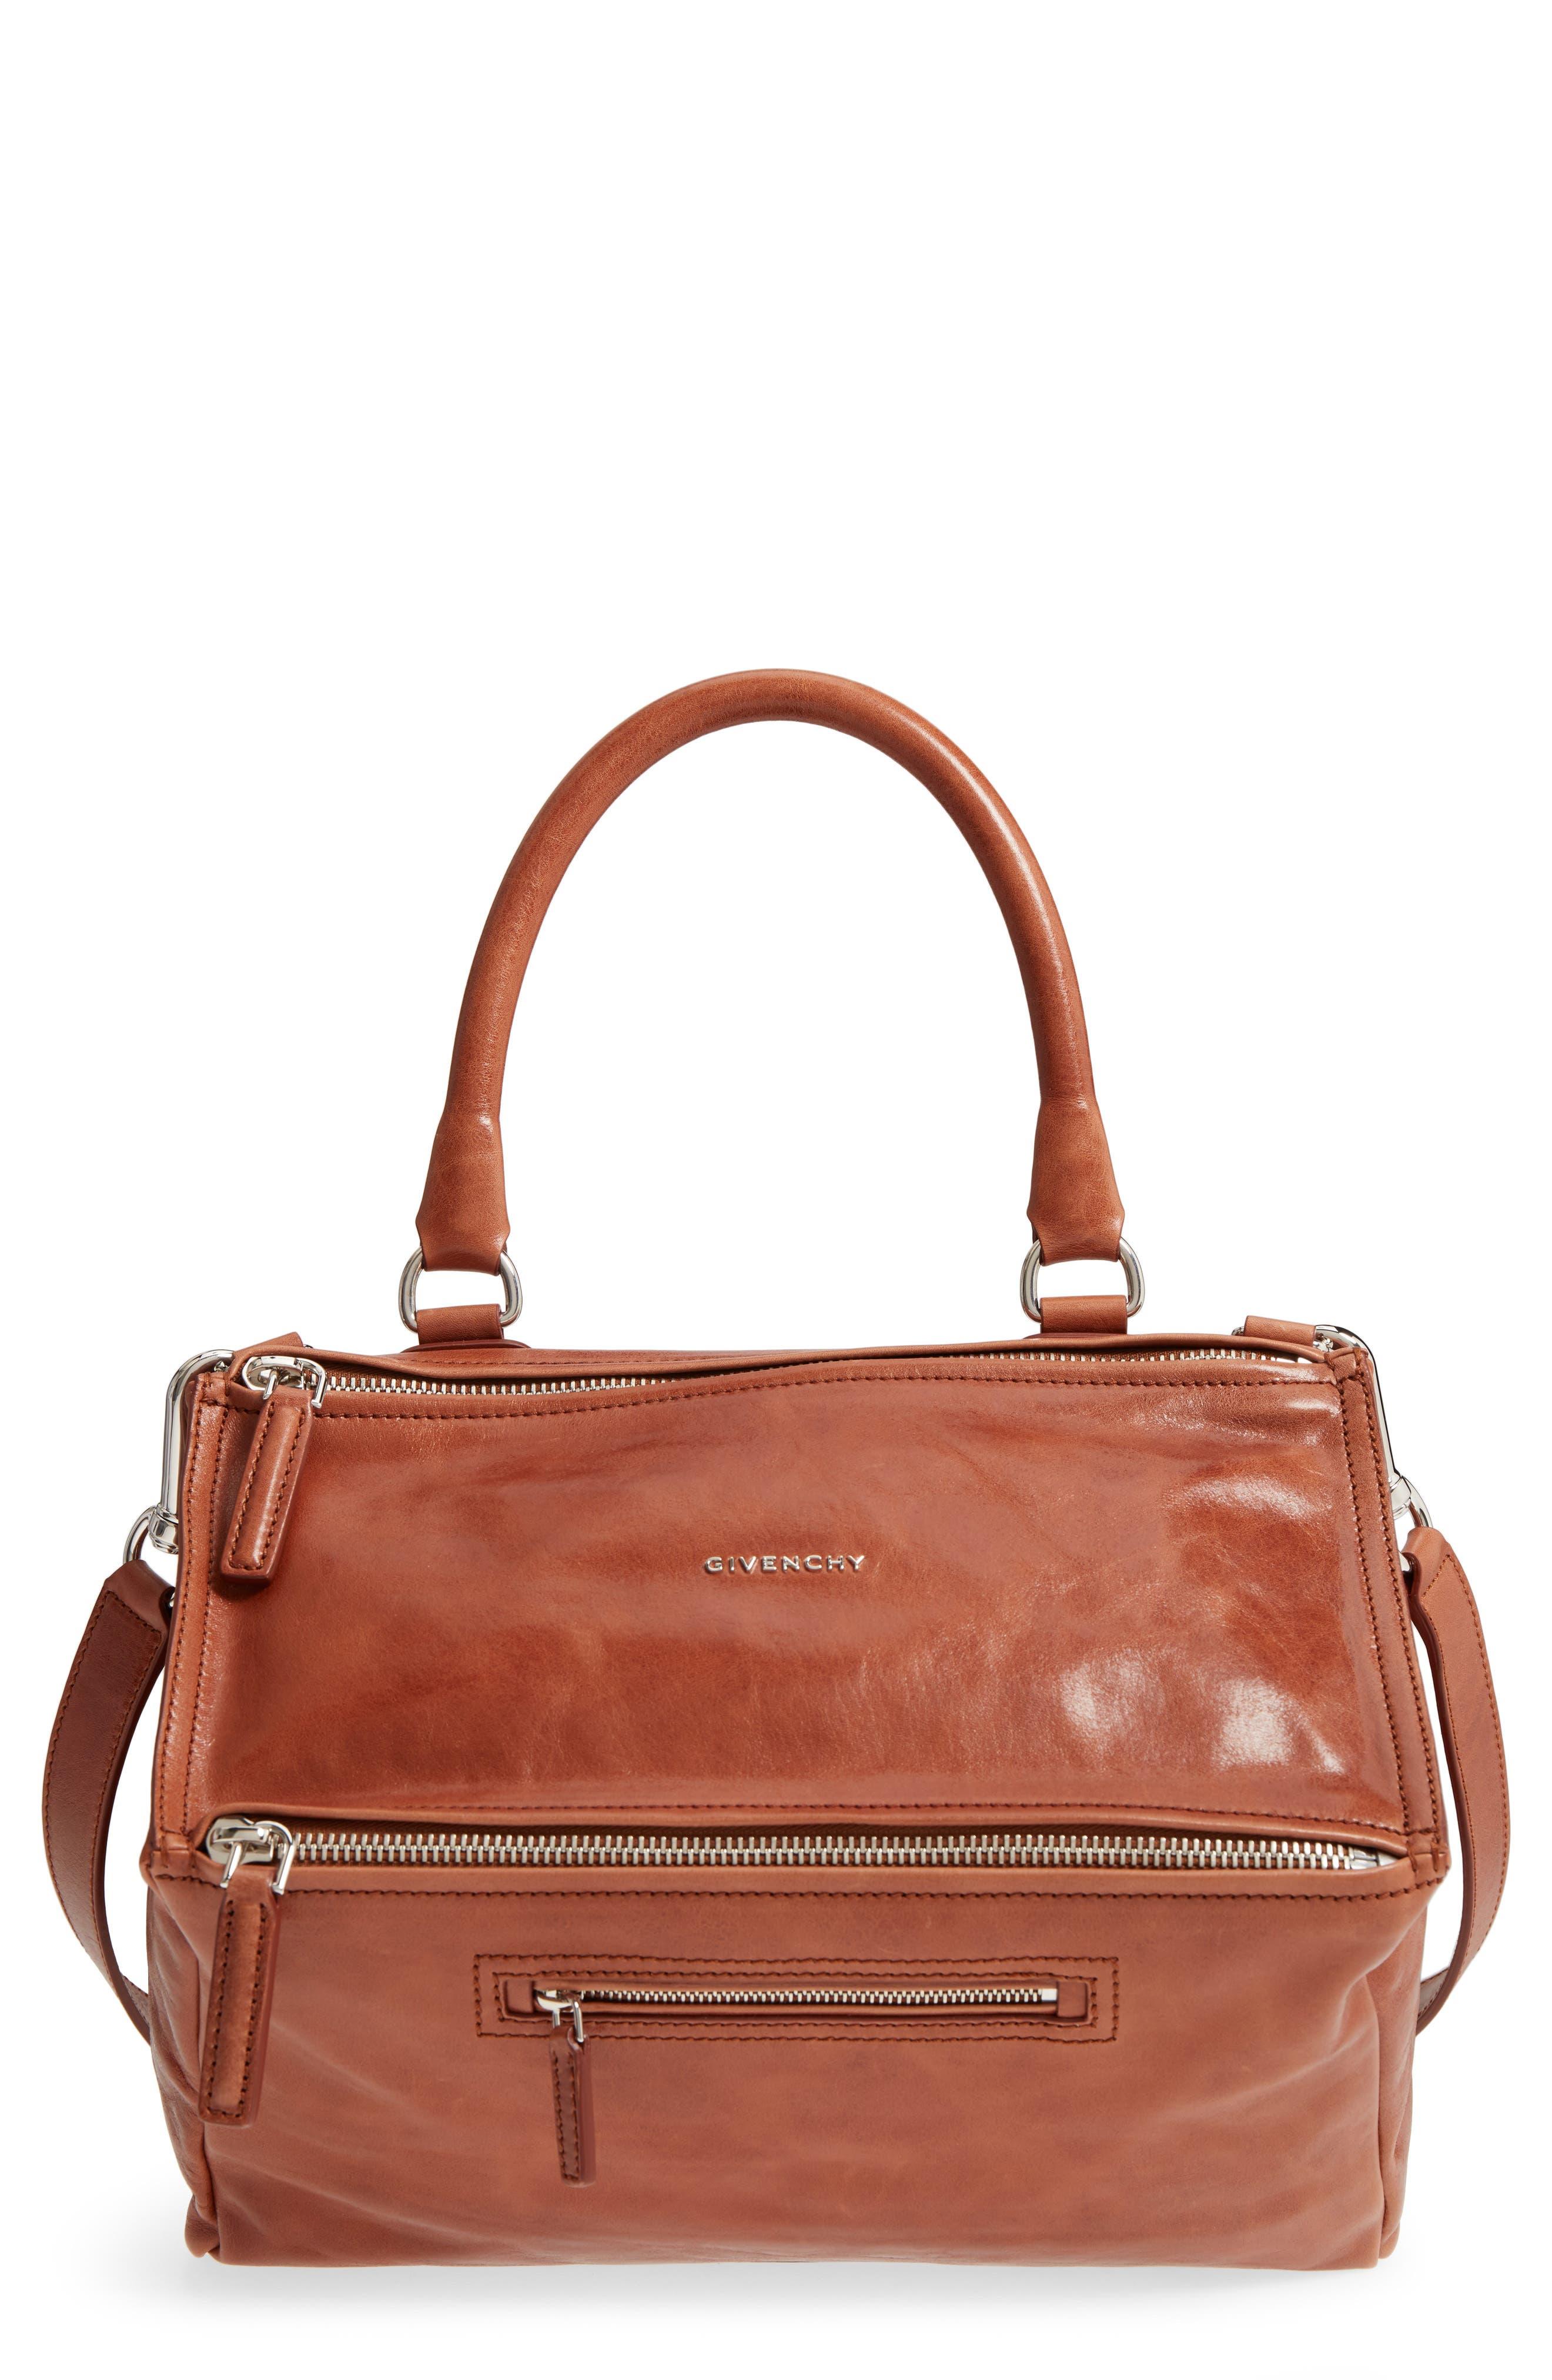 Medium Pandora Shiny Aged Leather Satchel,                             Main thumbnail 1, color,                             Cognac